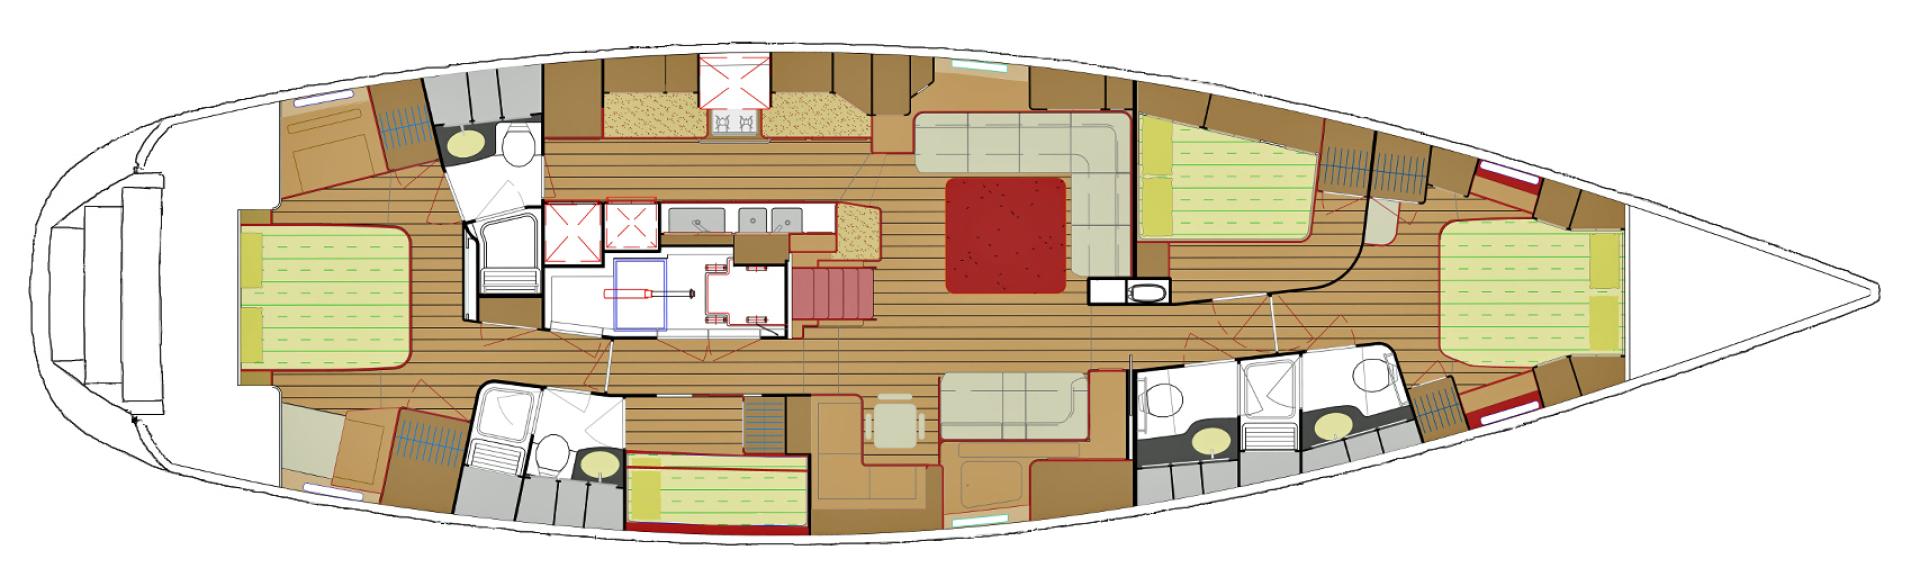 Hylas-70 Centerboard Cruiser 2007-AMANTE Barcelona-Spain-Layout-1555648   Thumbnail